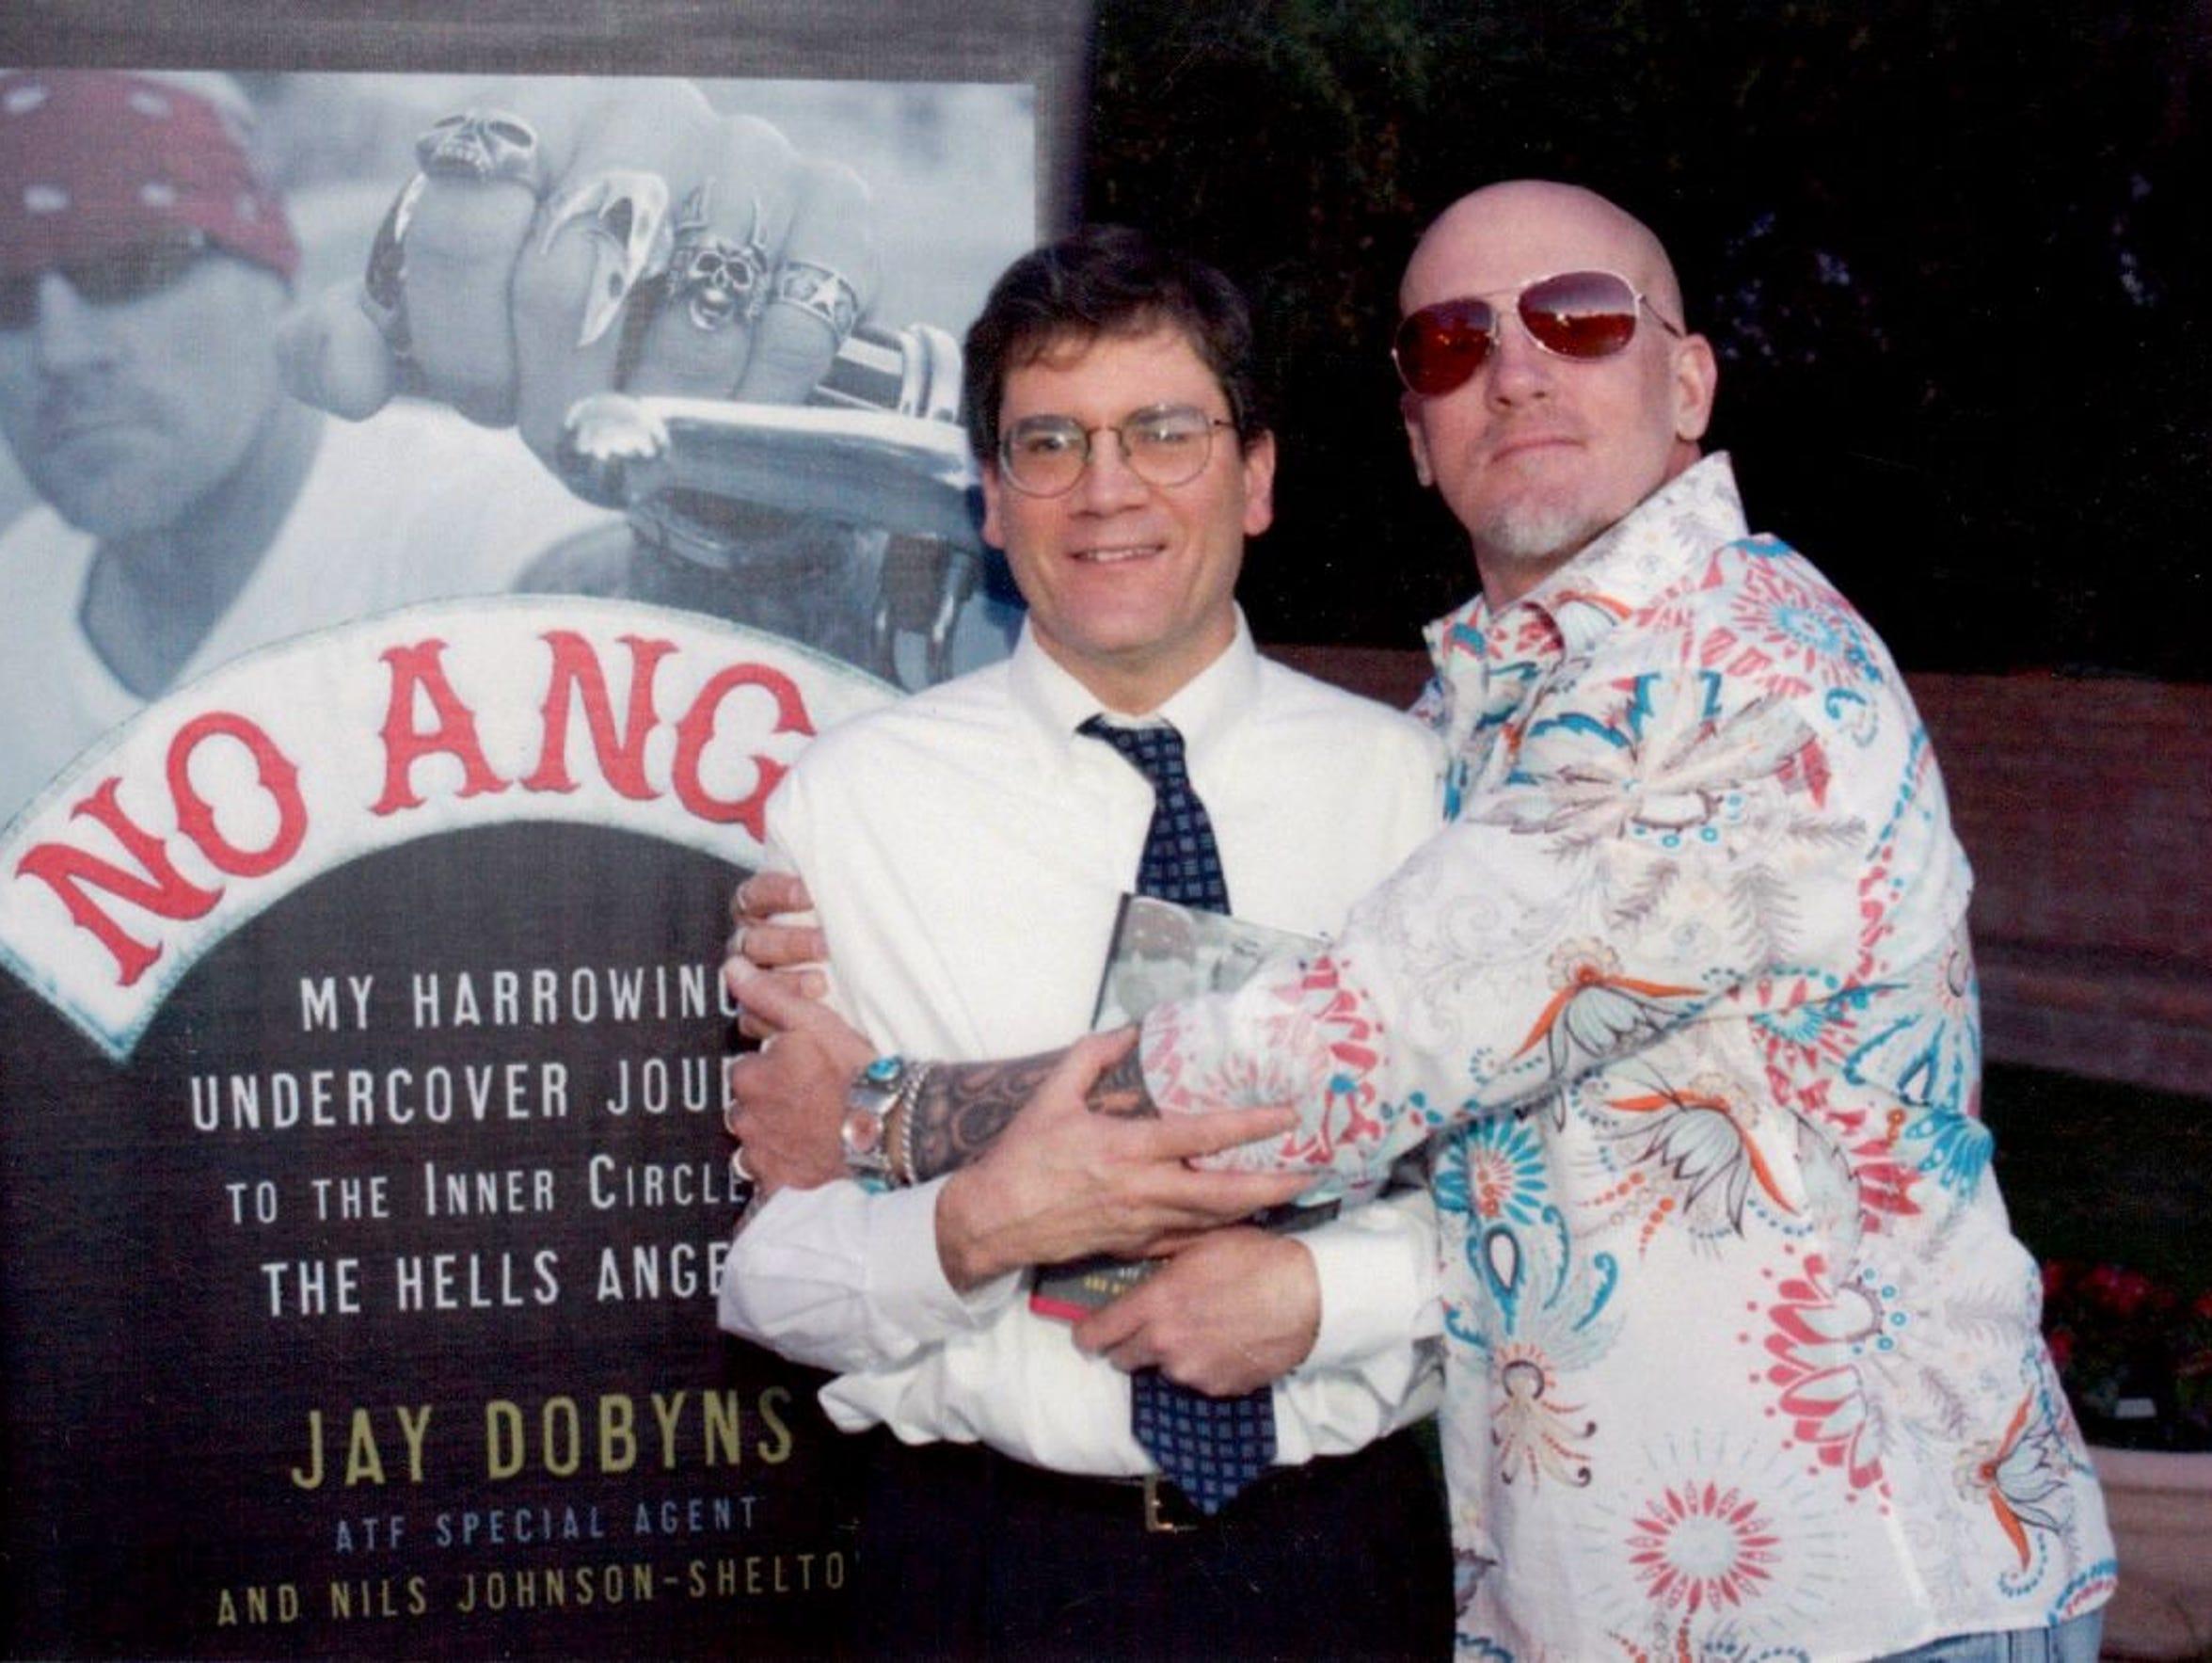 Jim Reed and Jay Dobyns at a backyard celebration of